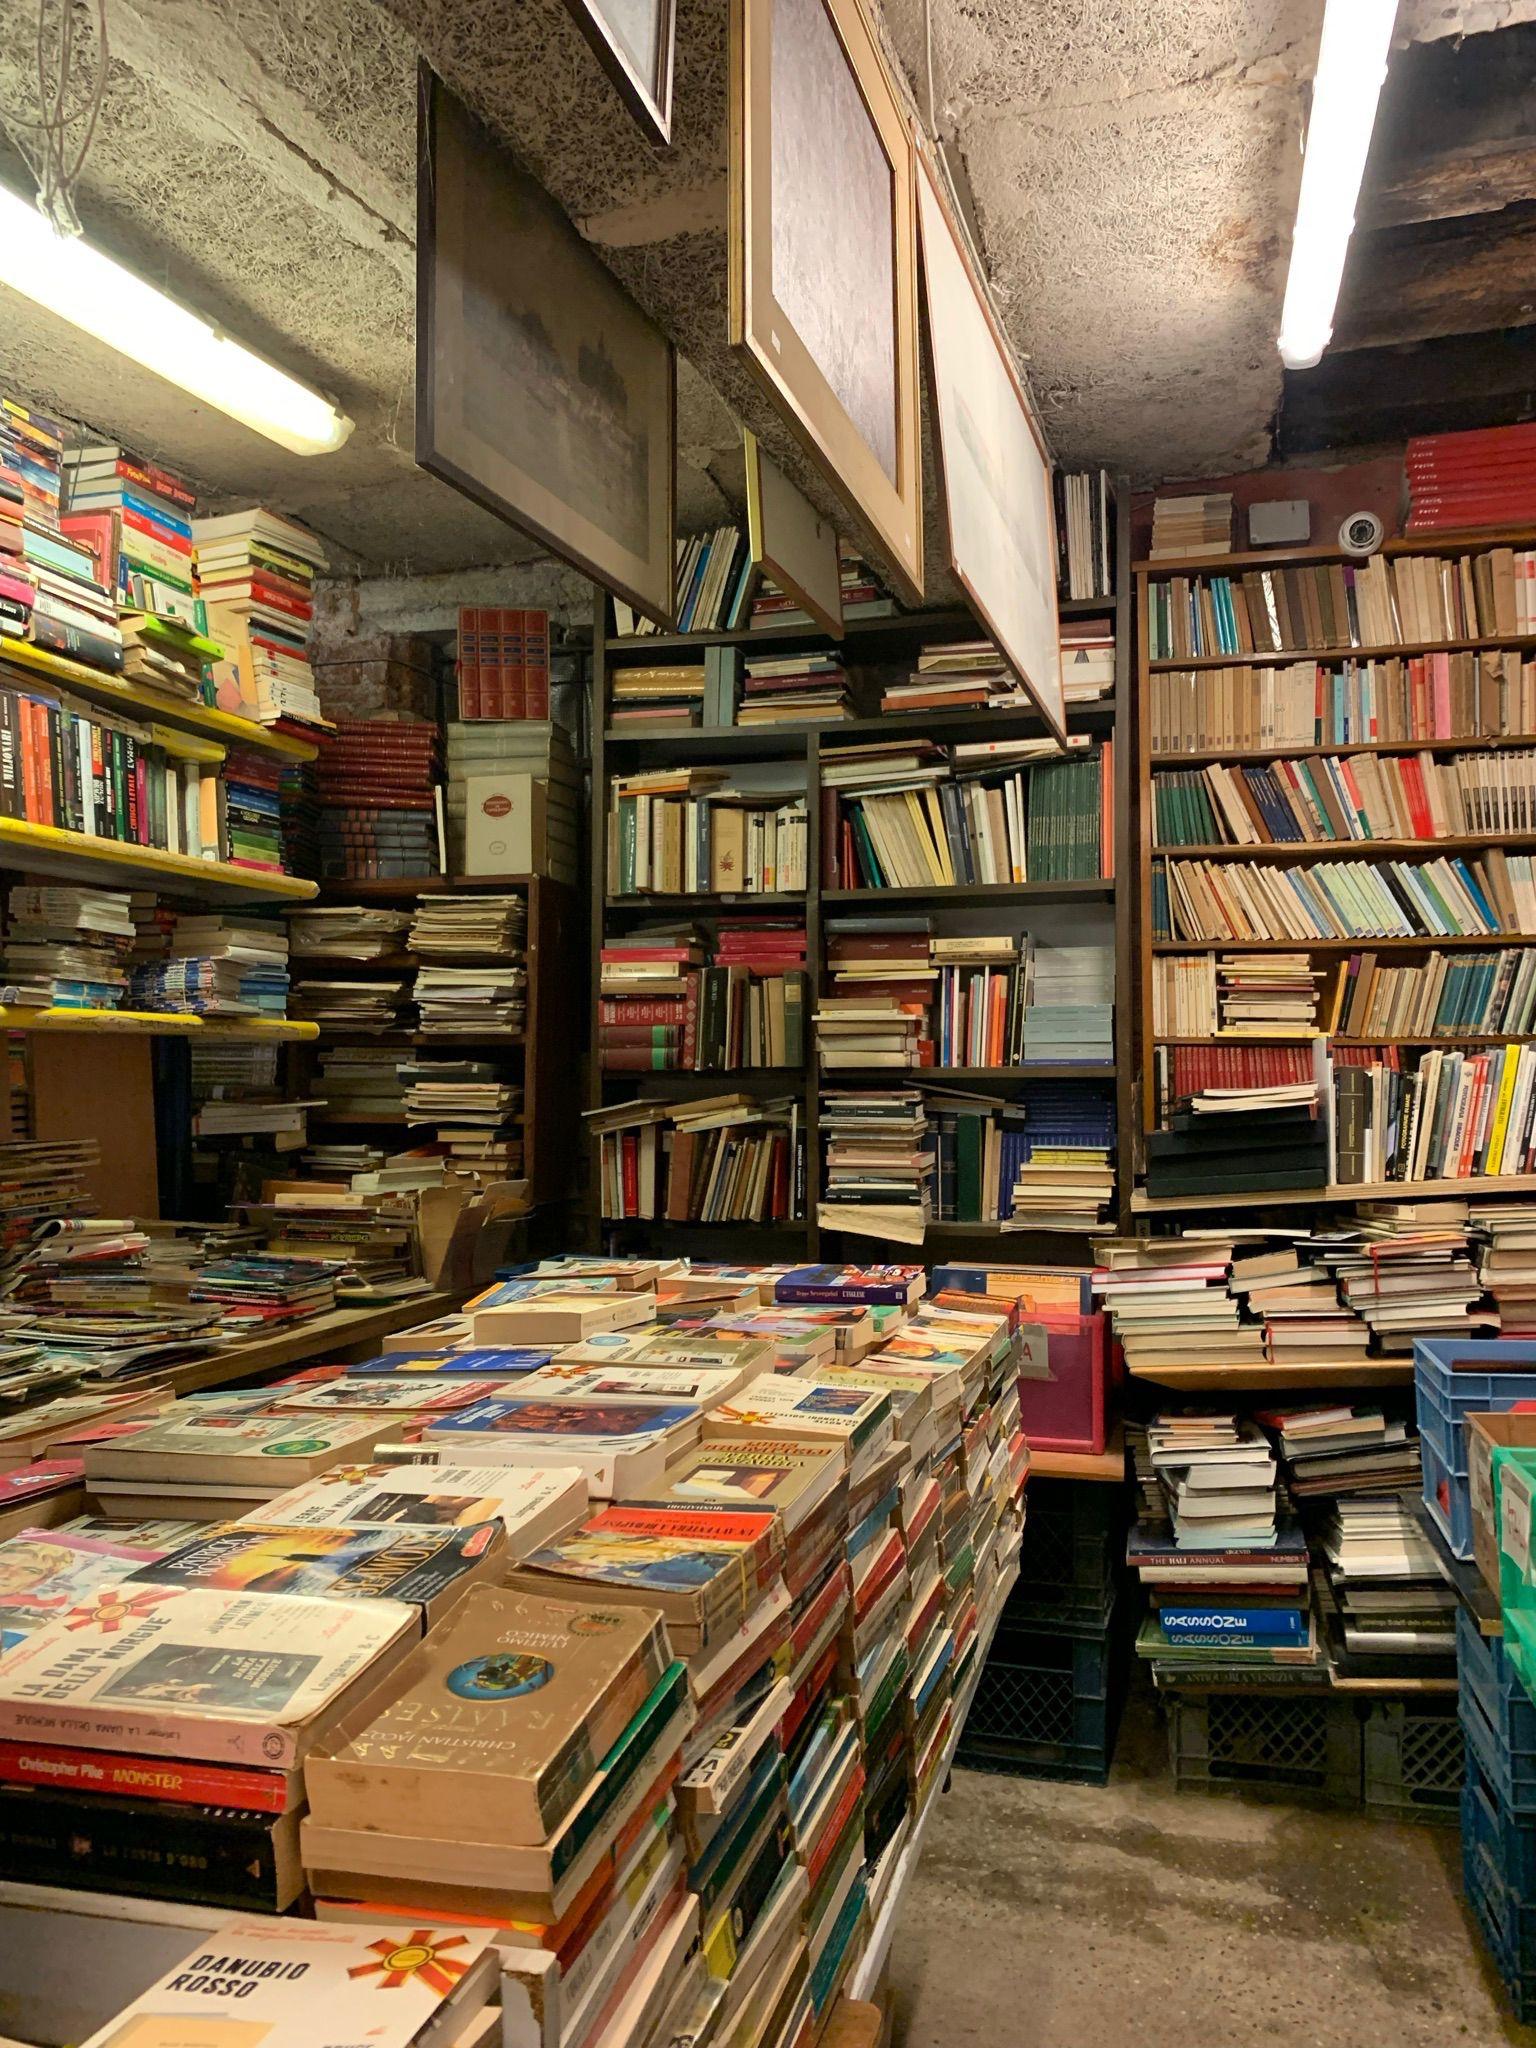 Libreria-acqua-alta-whynot-shopper-venecia-libros-segunda-mano-lifestyle-luigi-frizzo